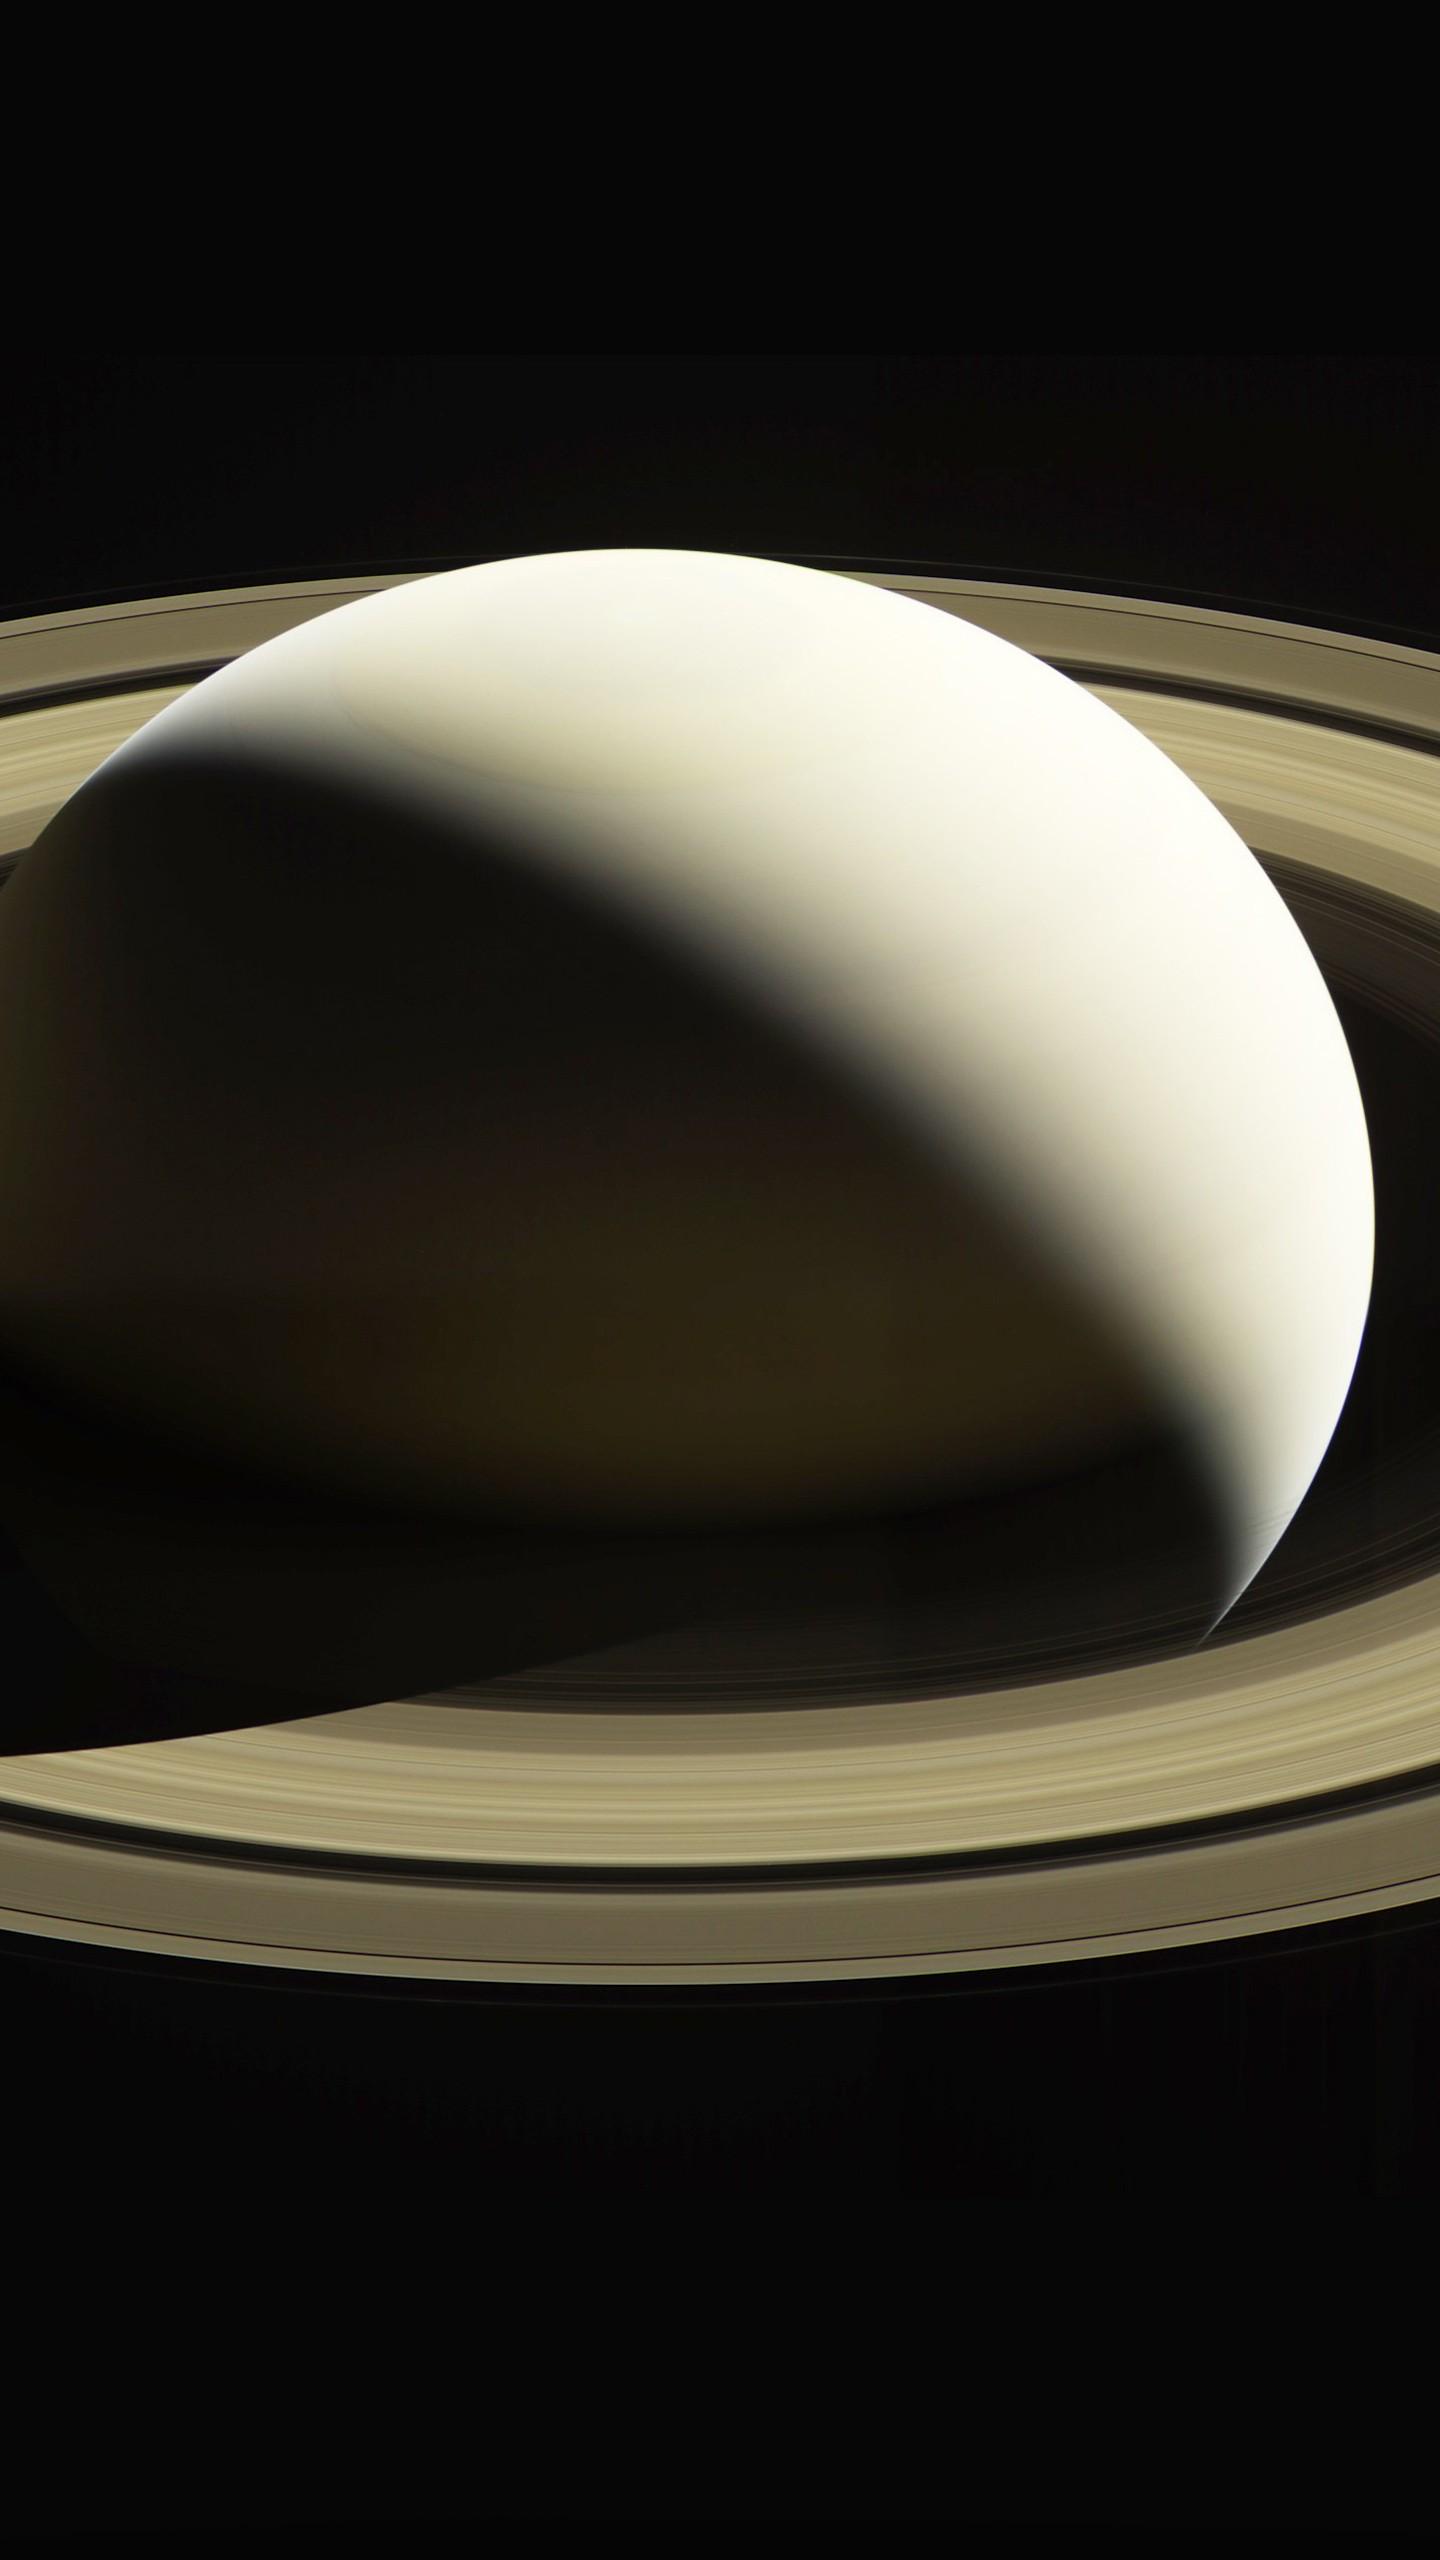 Universe Wallpaper Iphone X Cassini Saturn 4k Wallpapers Hd Wallpapers Id 21677